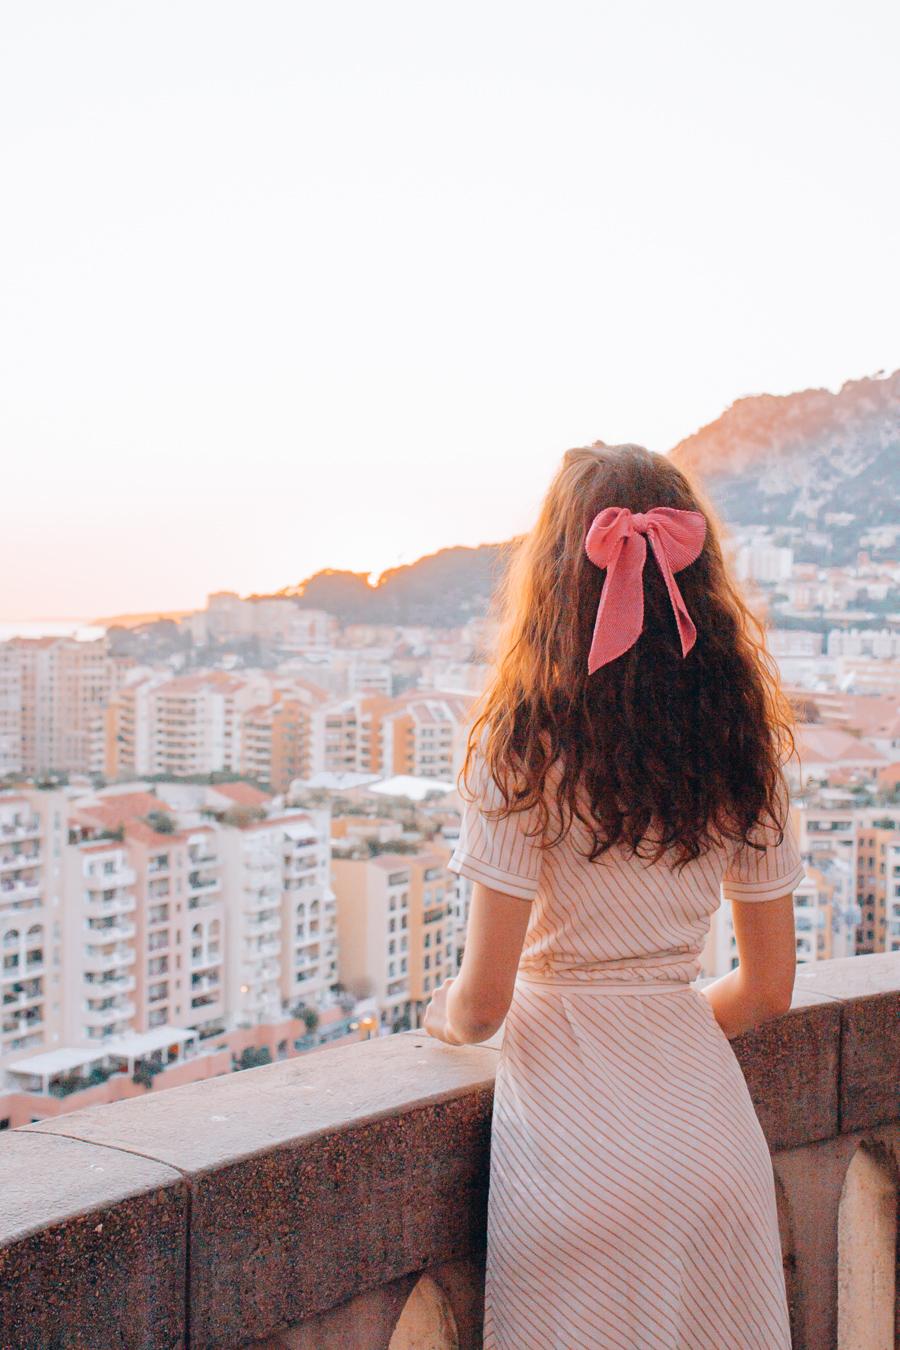 Sunset in Monaco